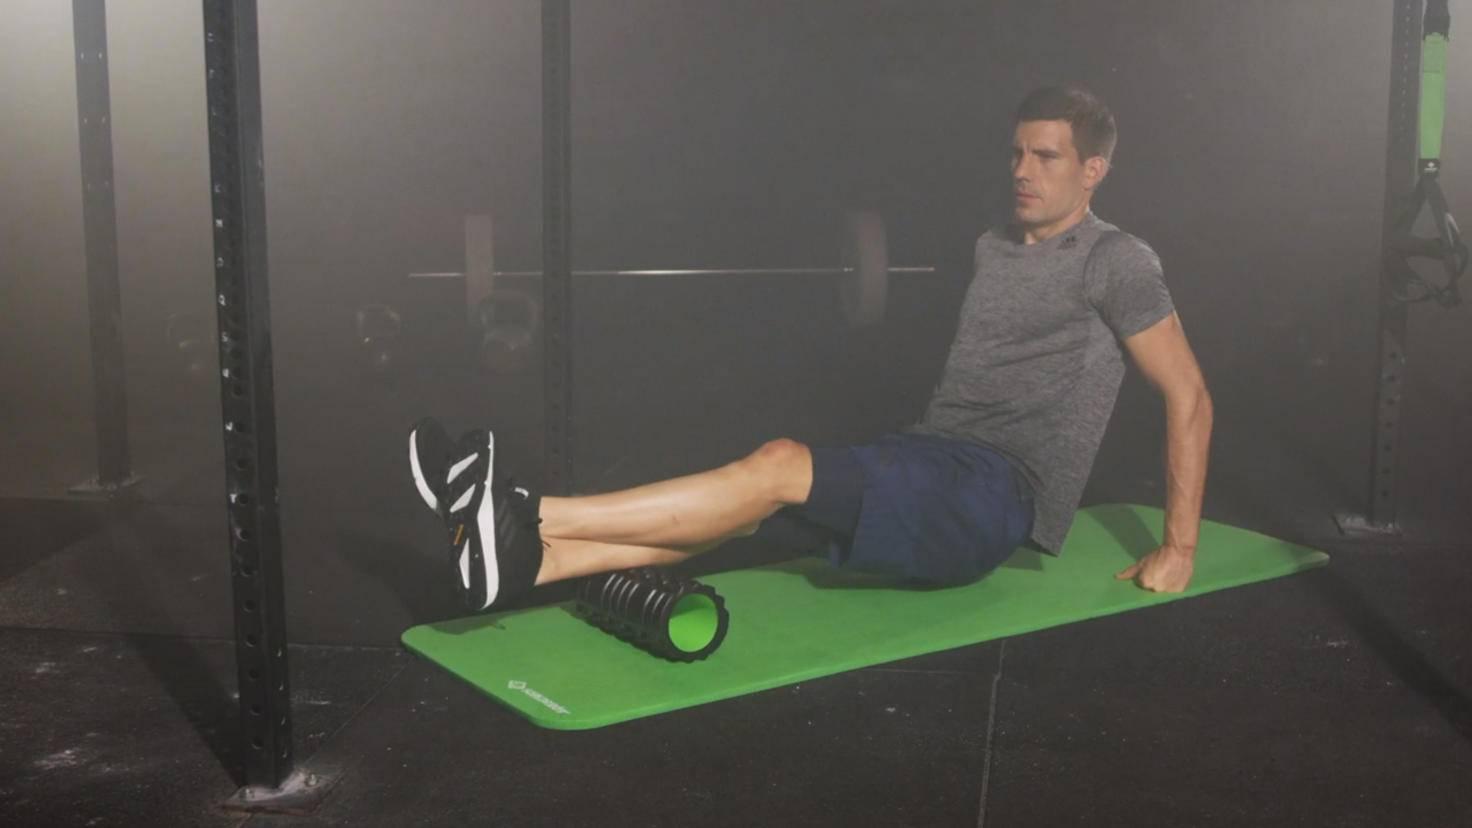 fitnessstudio-zu-hause-guenstige-geraete-faszienrolle-foam-roller